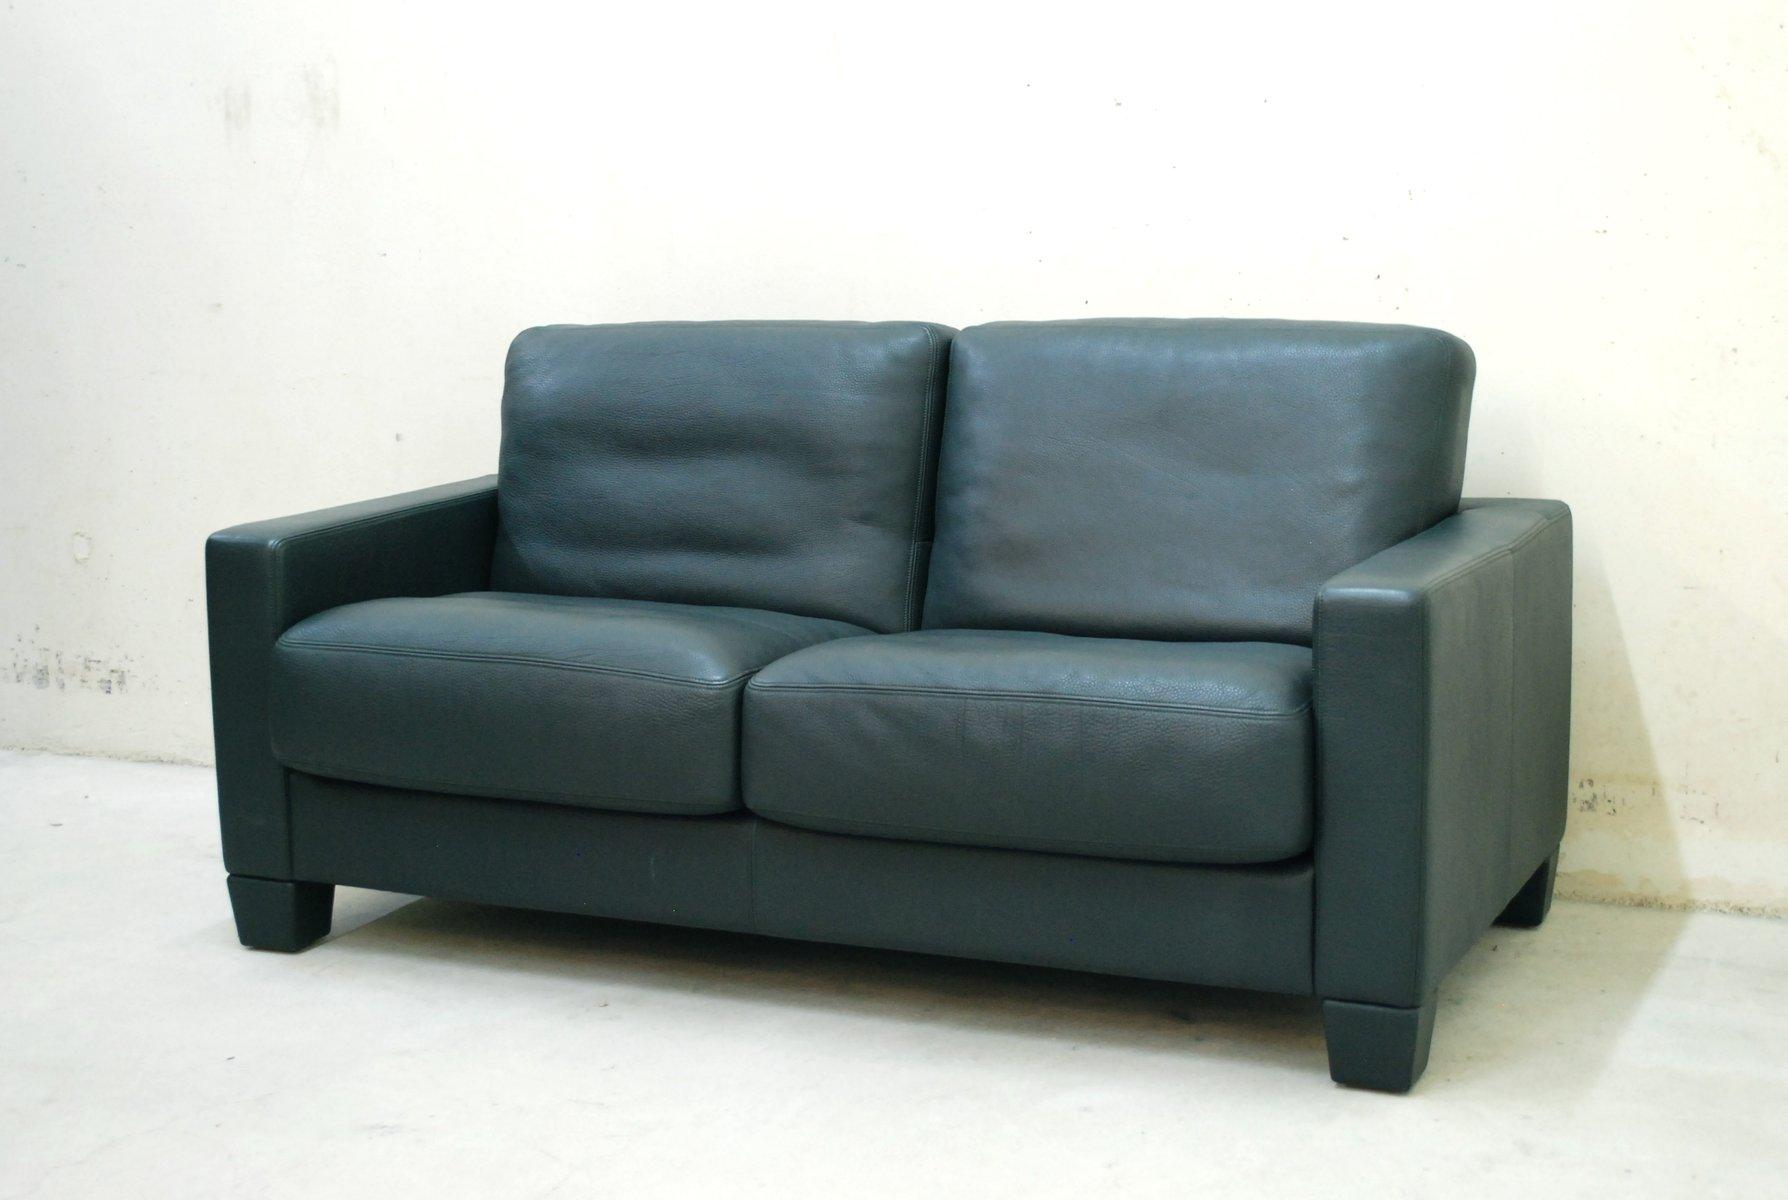 ds 17 sofa von de sede 1980er bei pamono kaufen. Black Bedroom Furniture Sets. Home Design Ideas